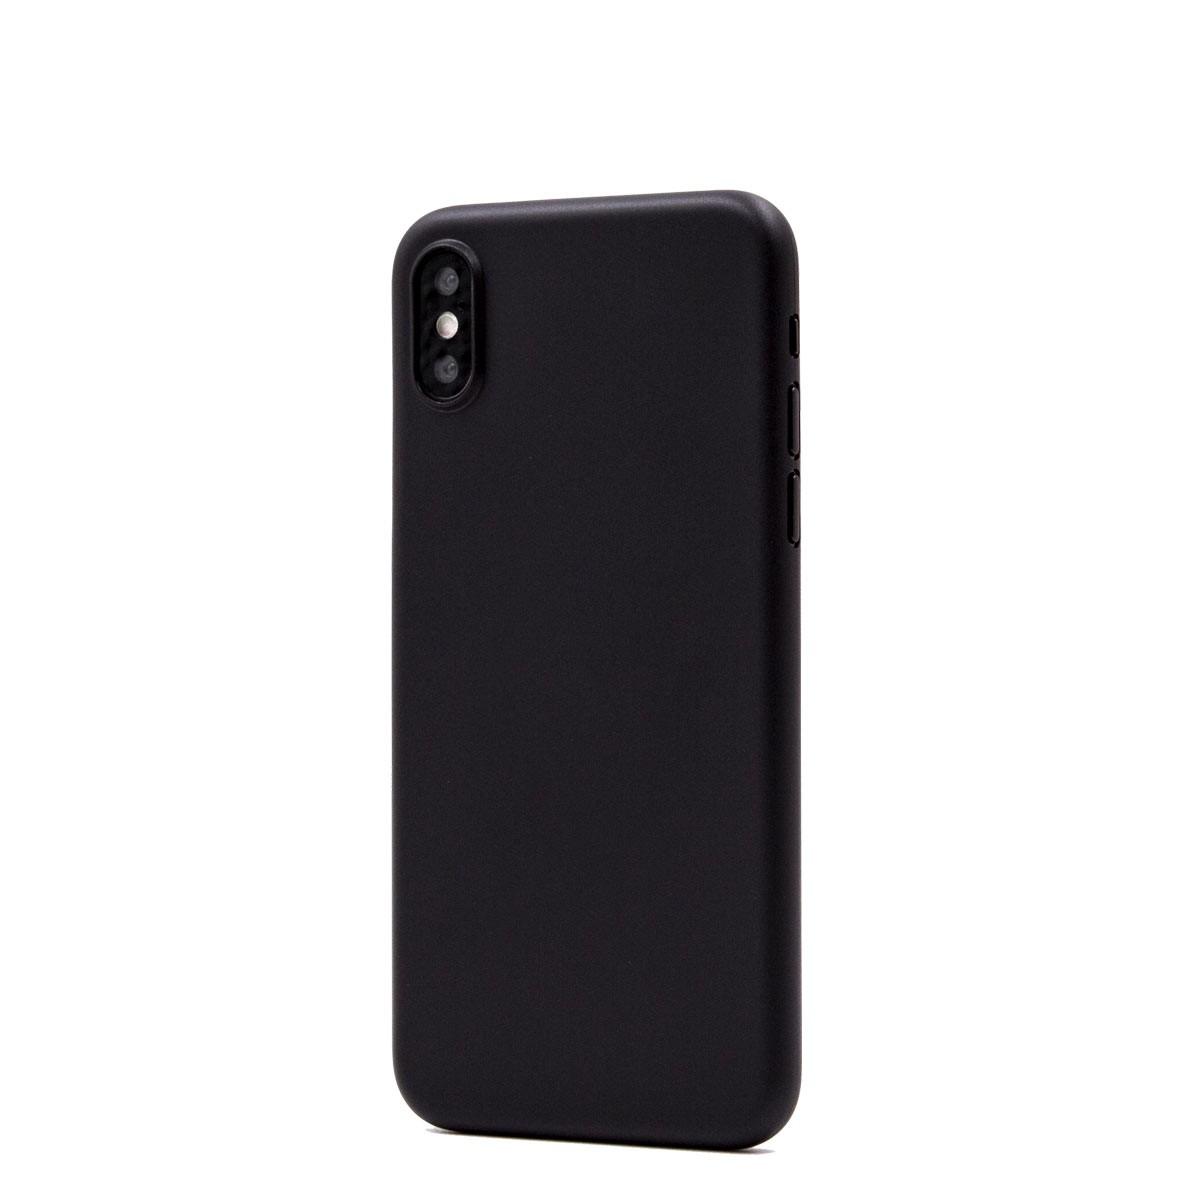 Capac protectie spate cellara colectia thin pentru iphone xs - negru